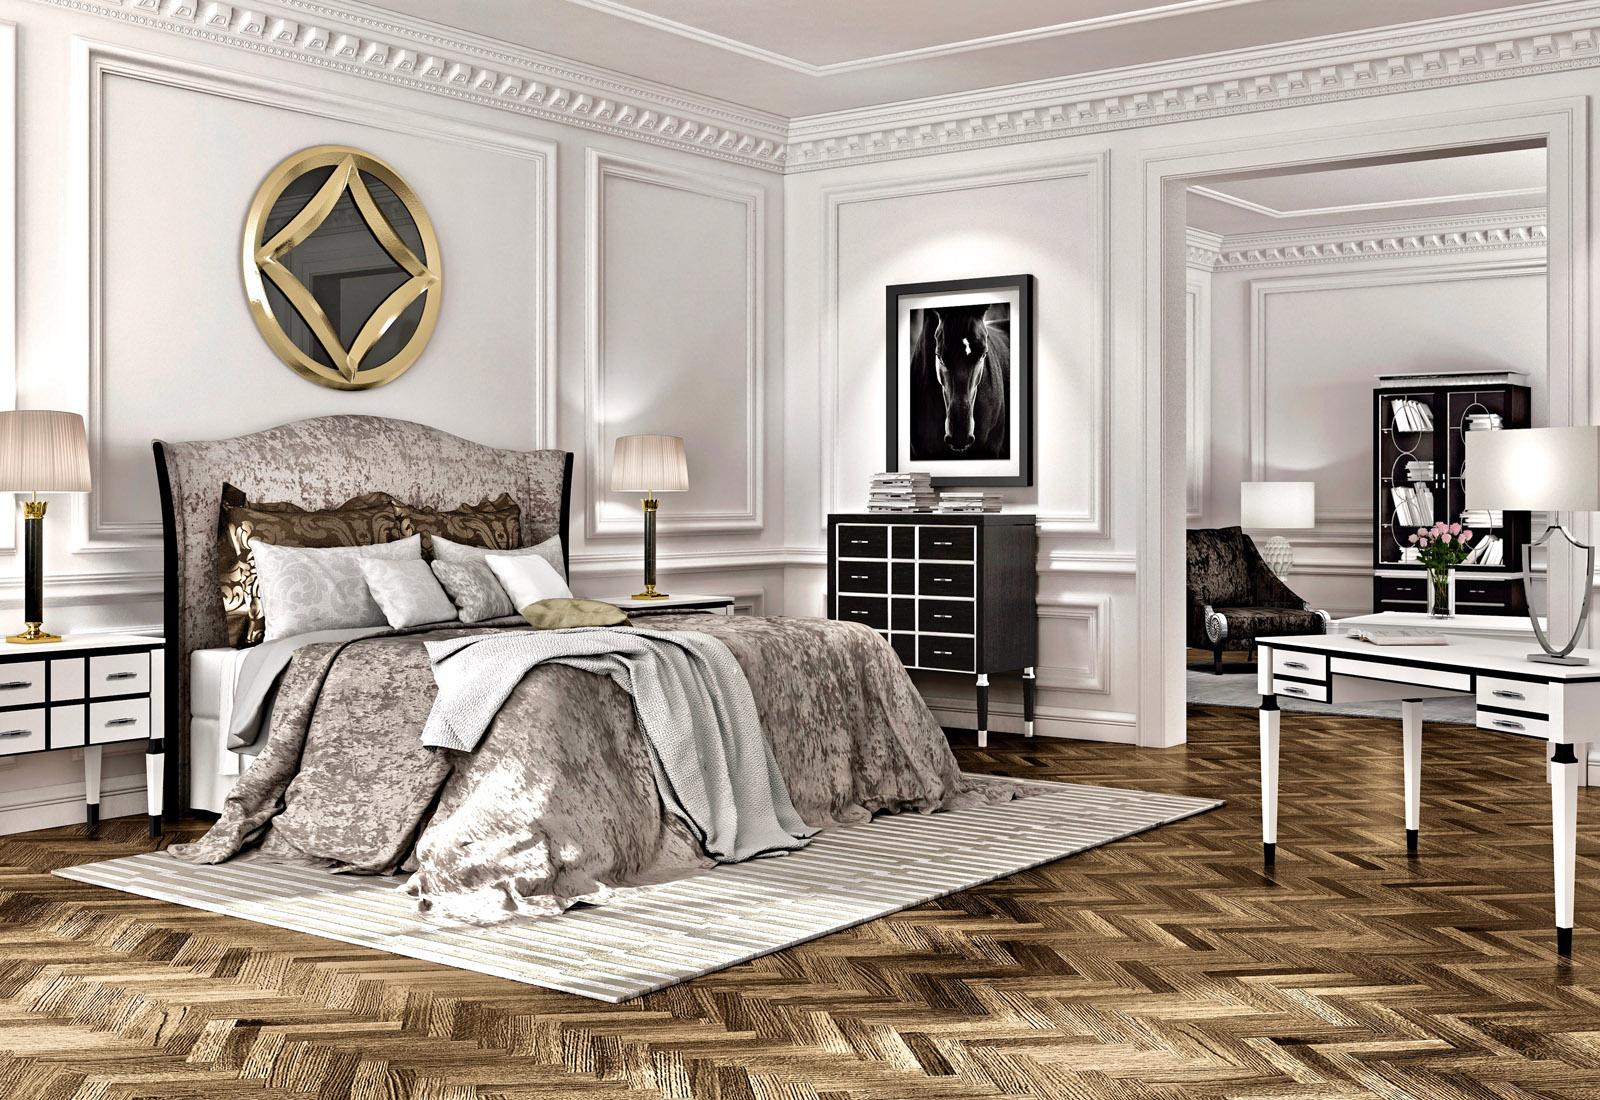 Coleccion Alexandra: Luxury Bedroom Furniture Sets